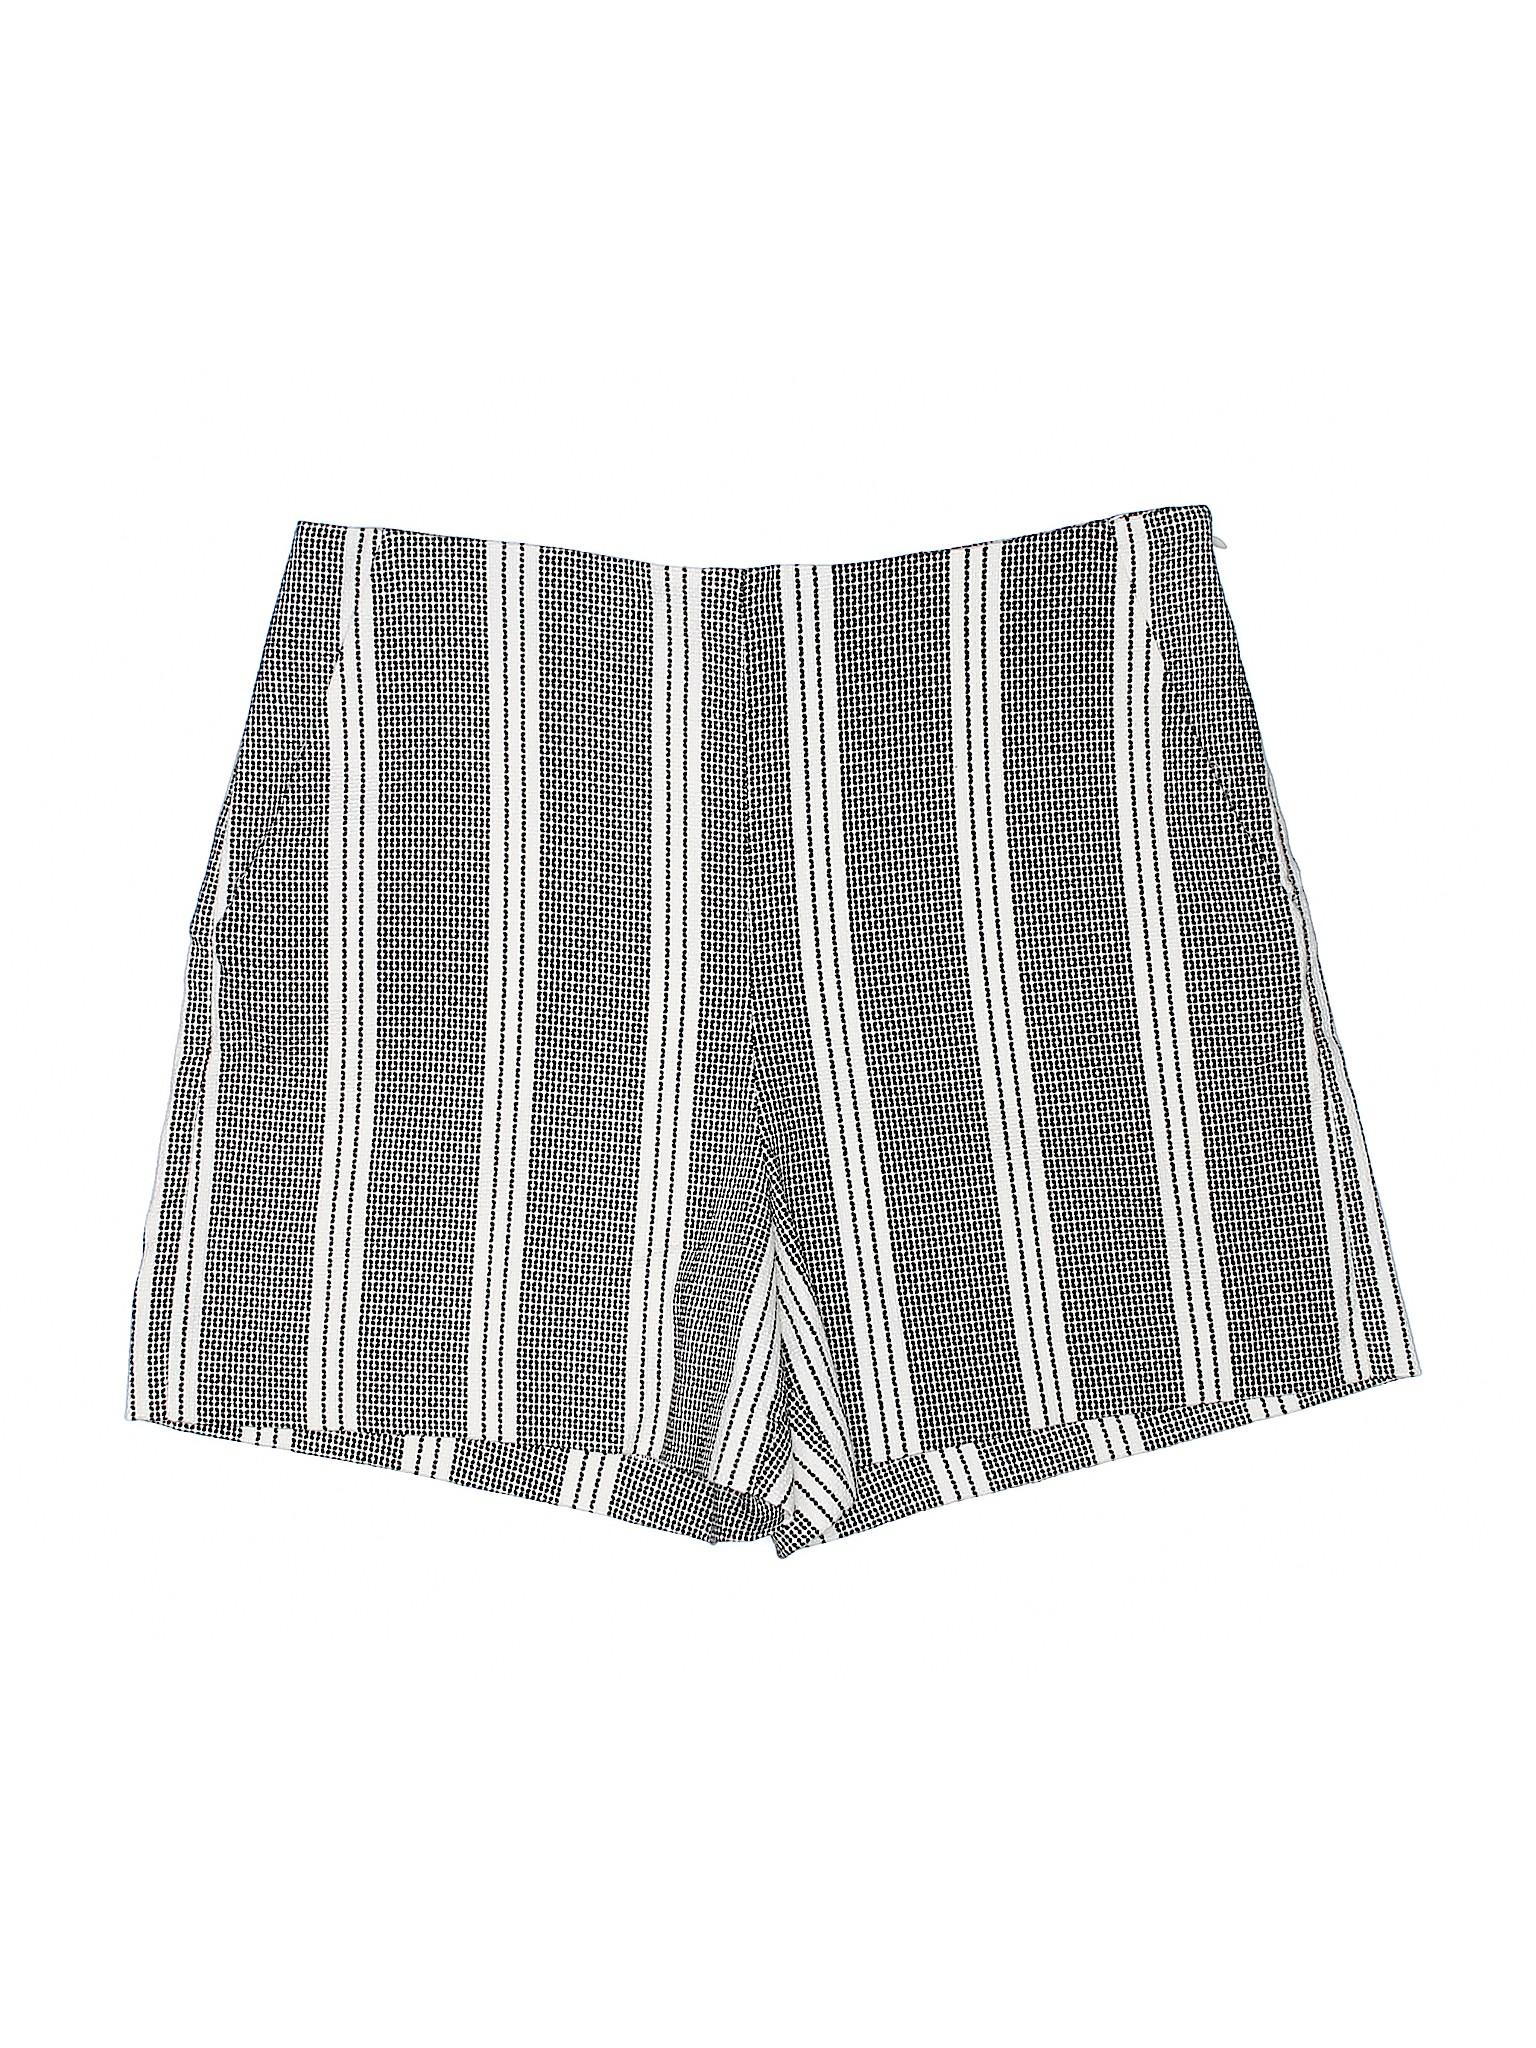 Boutique Boutique Ann Taylor Taylor Boutique Shorts Ann Dressy Ann Dressy Shorts gpXpq